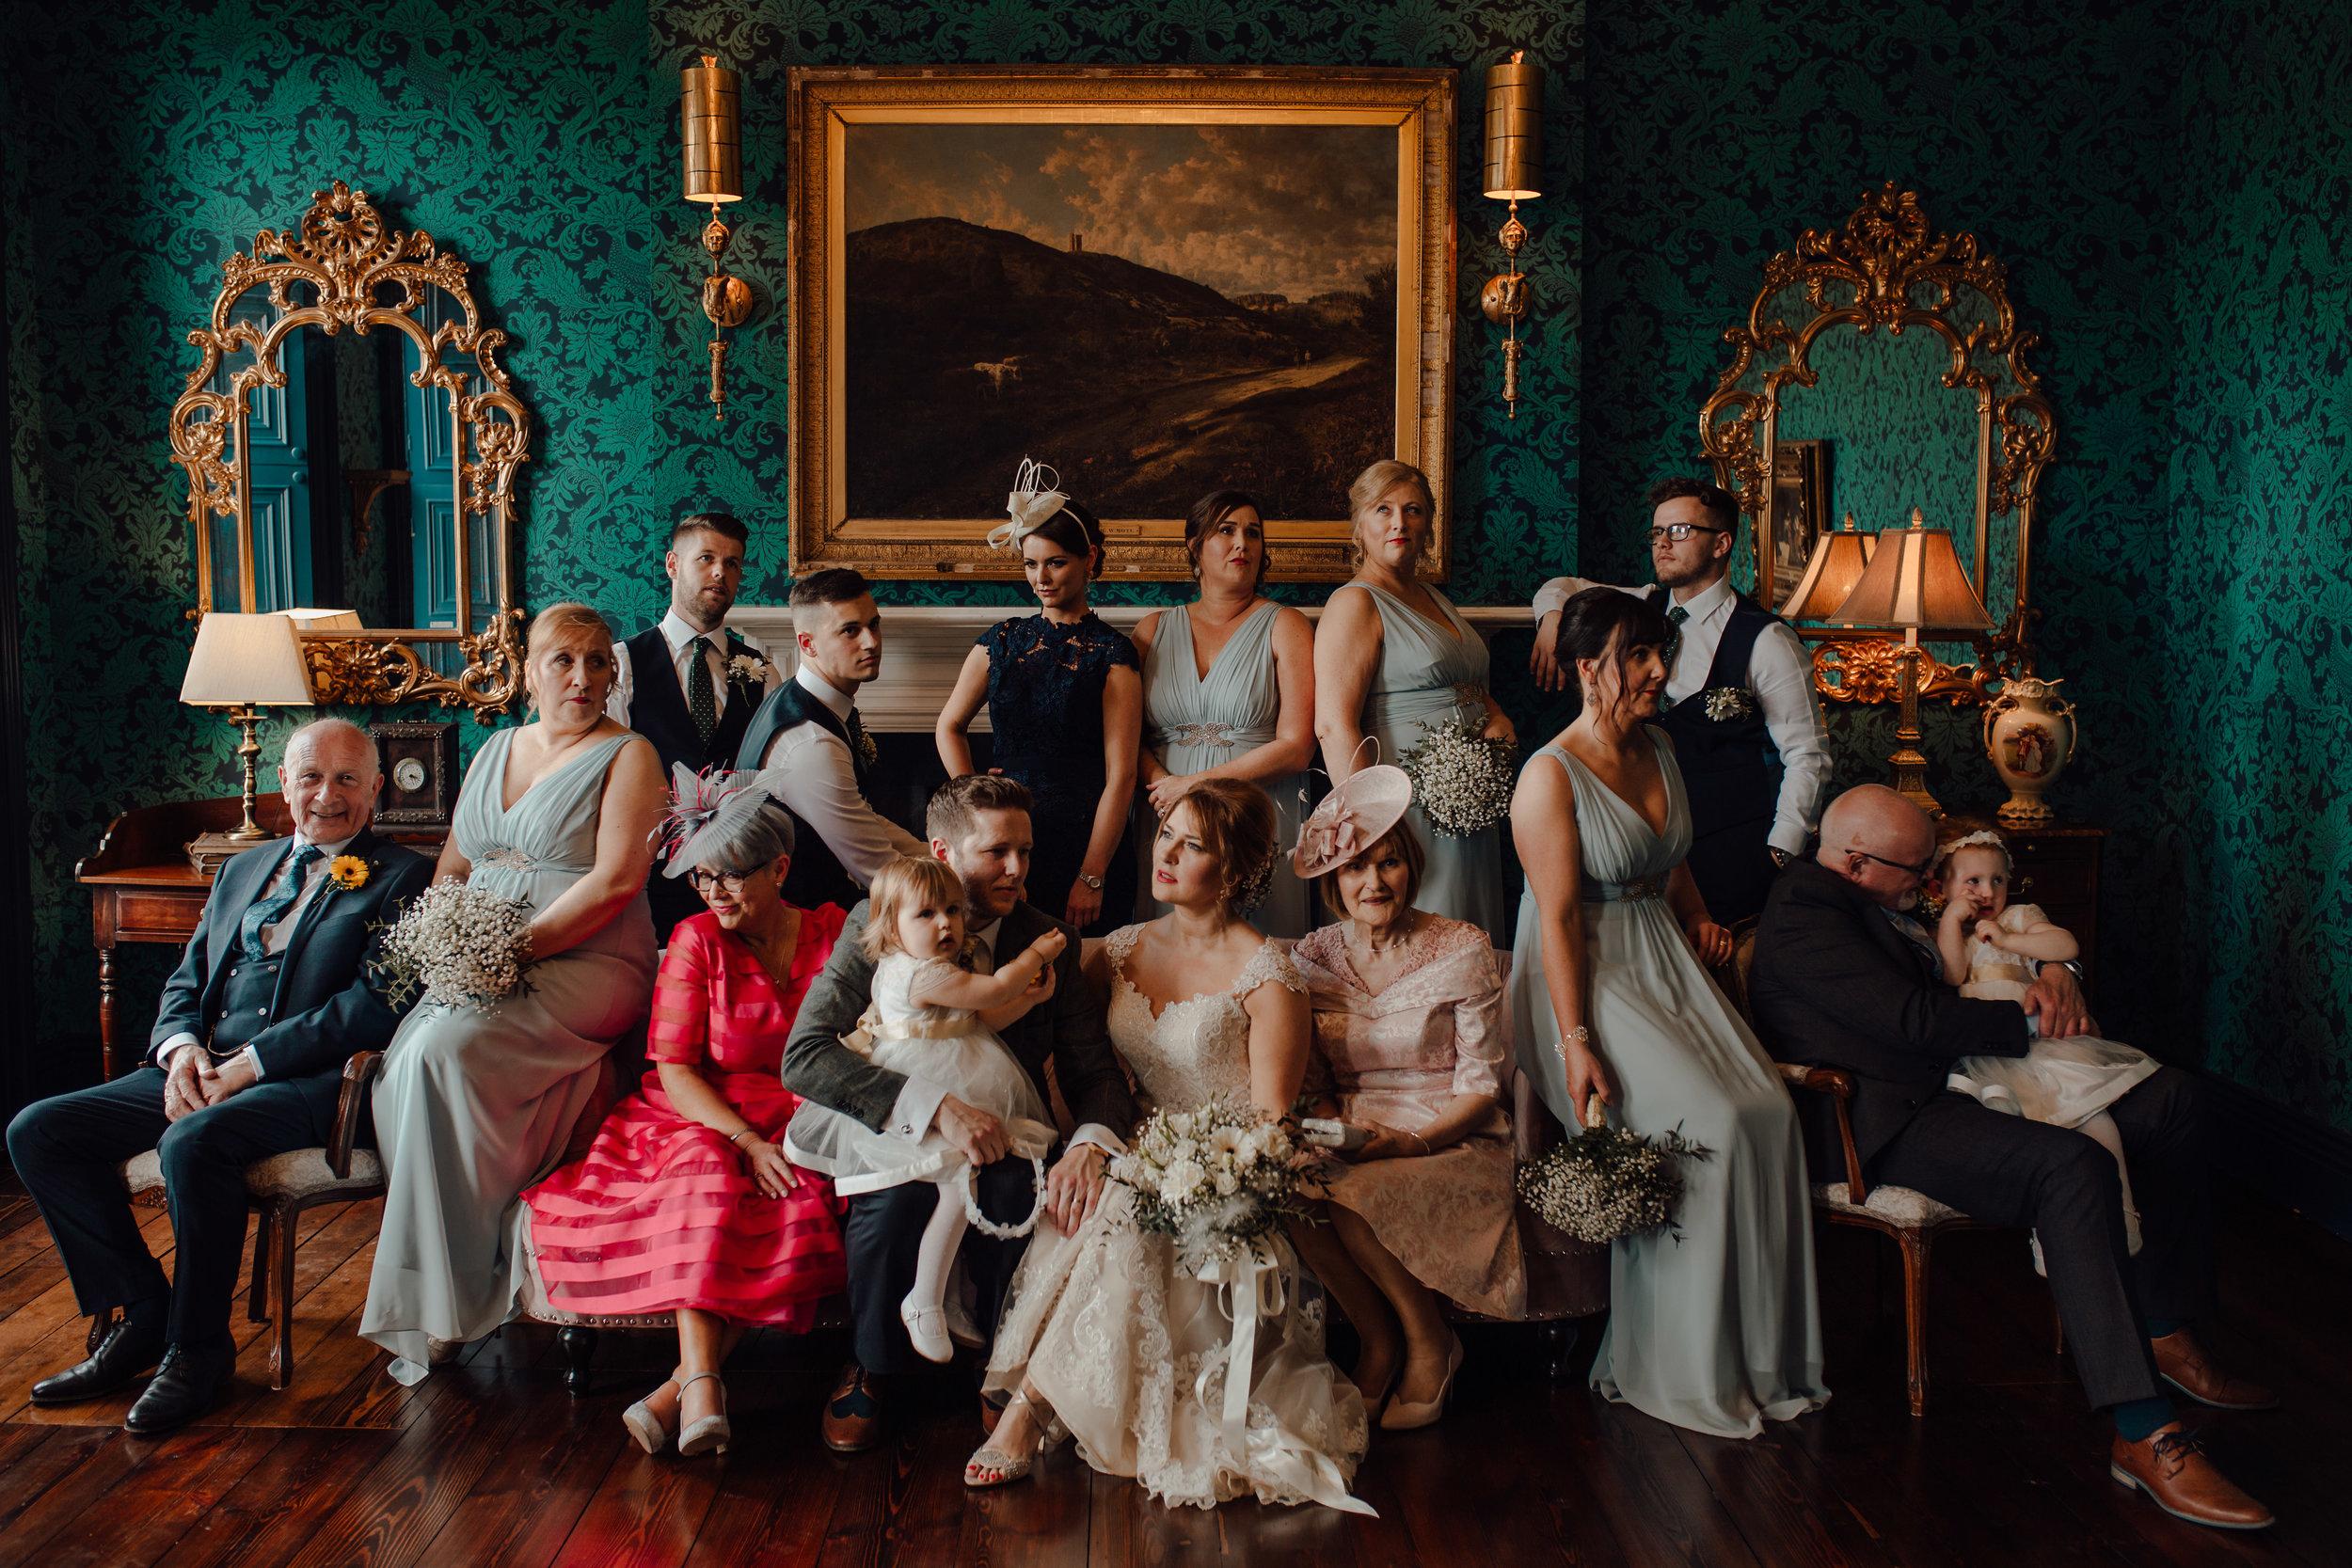 boyne-hill-house-vanity-fair-portrait-wedding-photographer-ireland